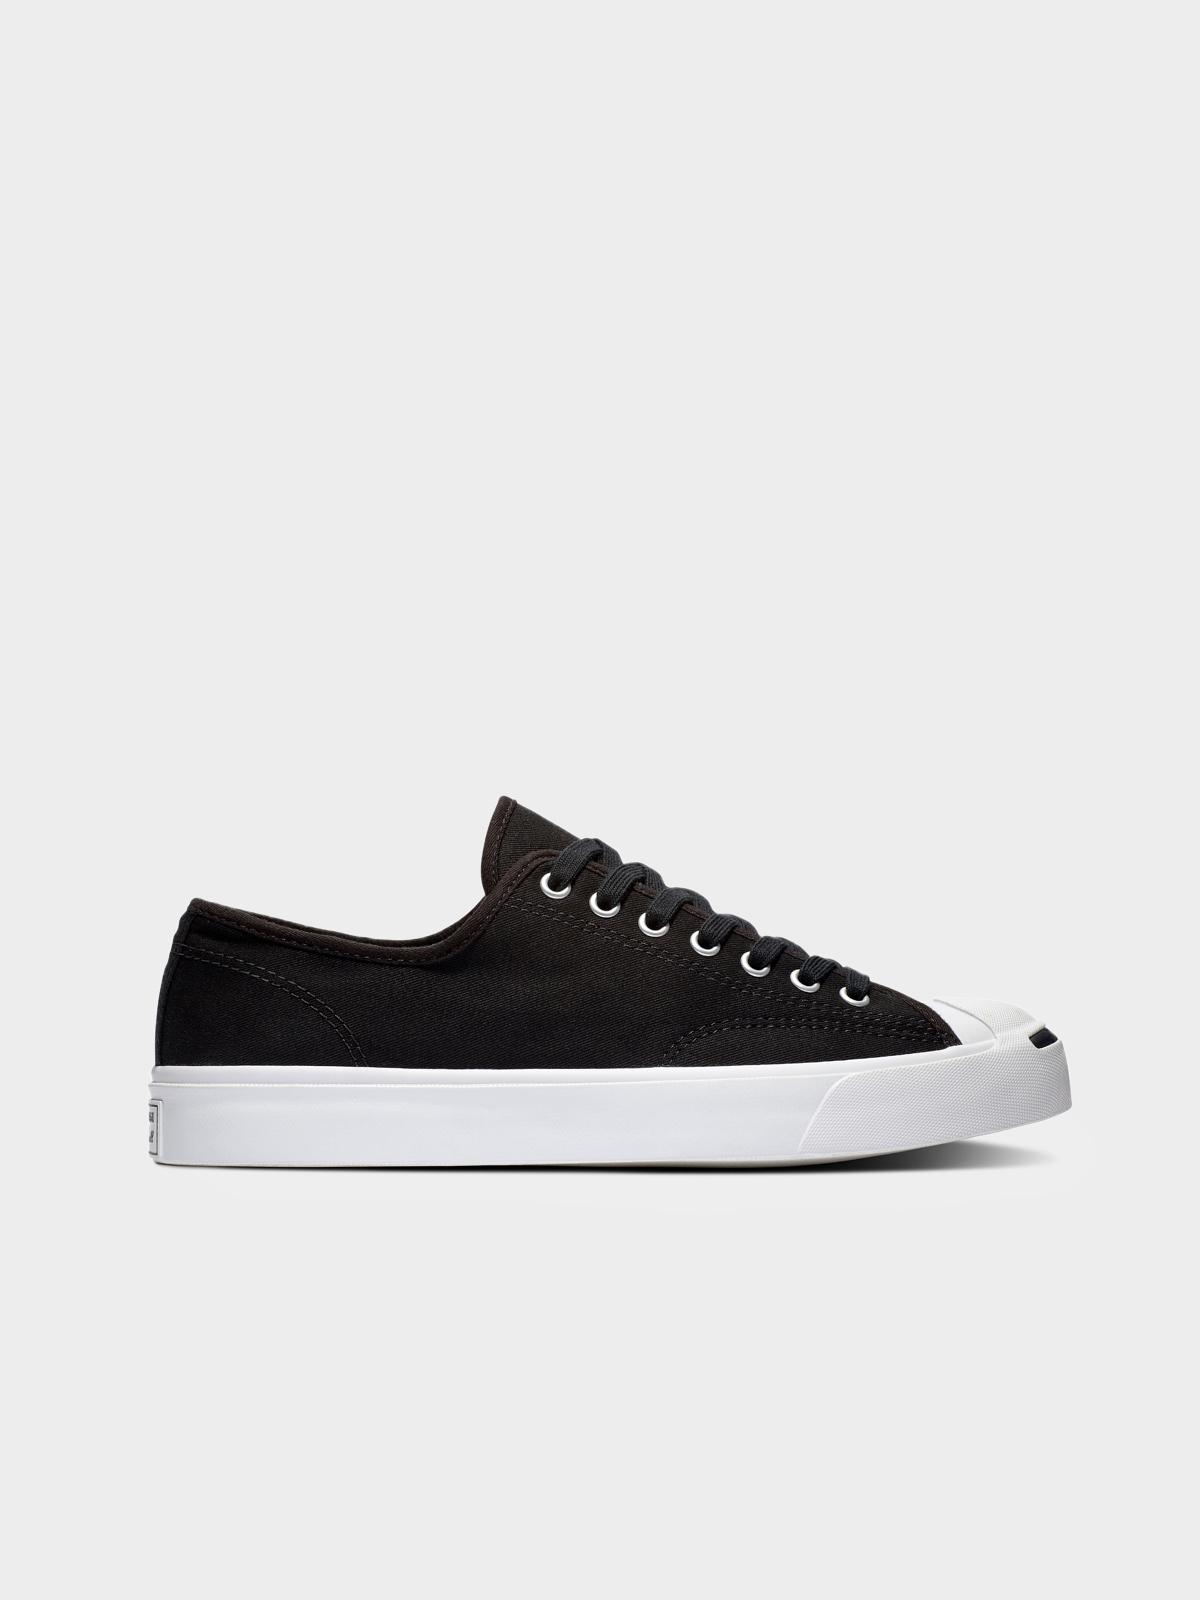 Converse All Star Hi Canvas Sneakers Black